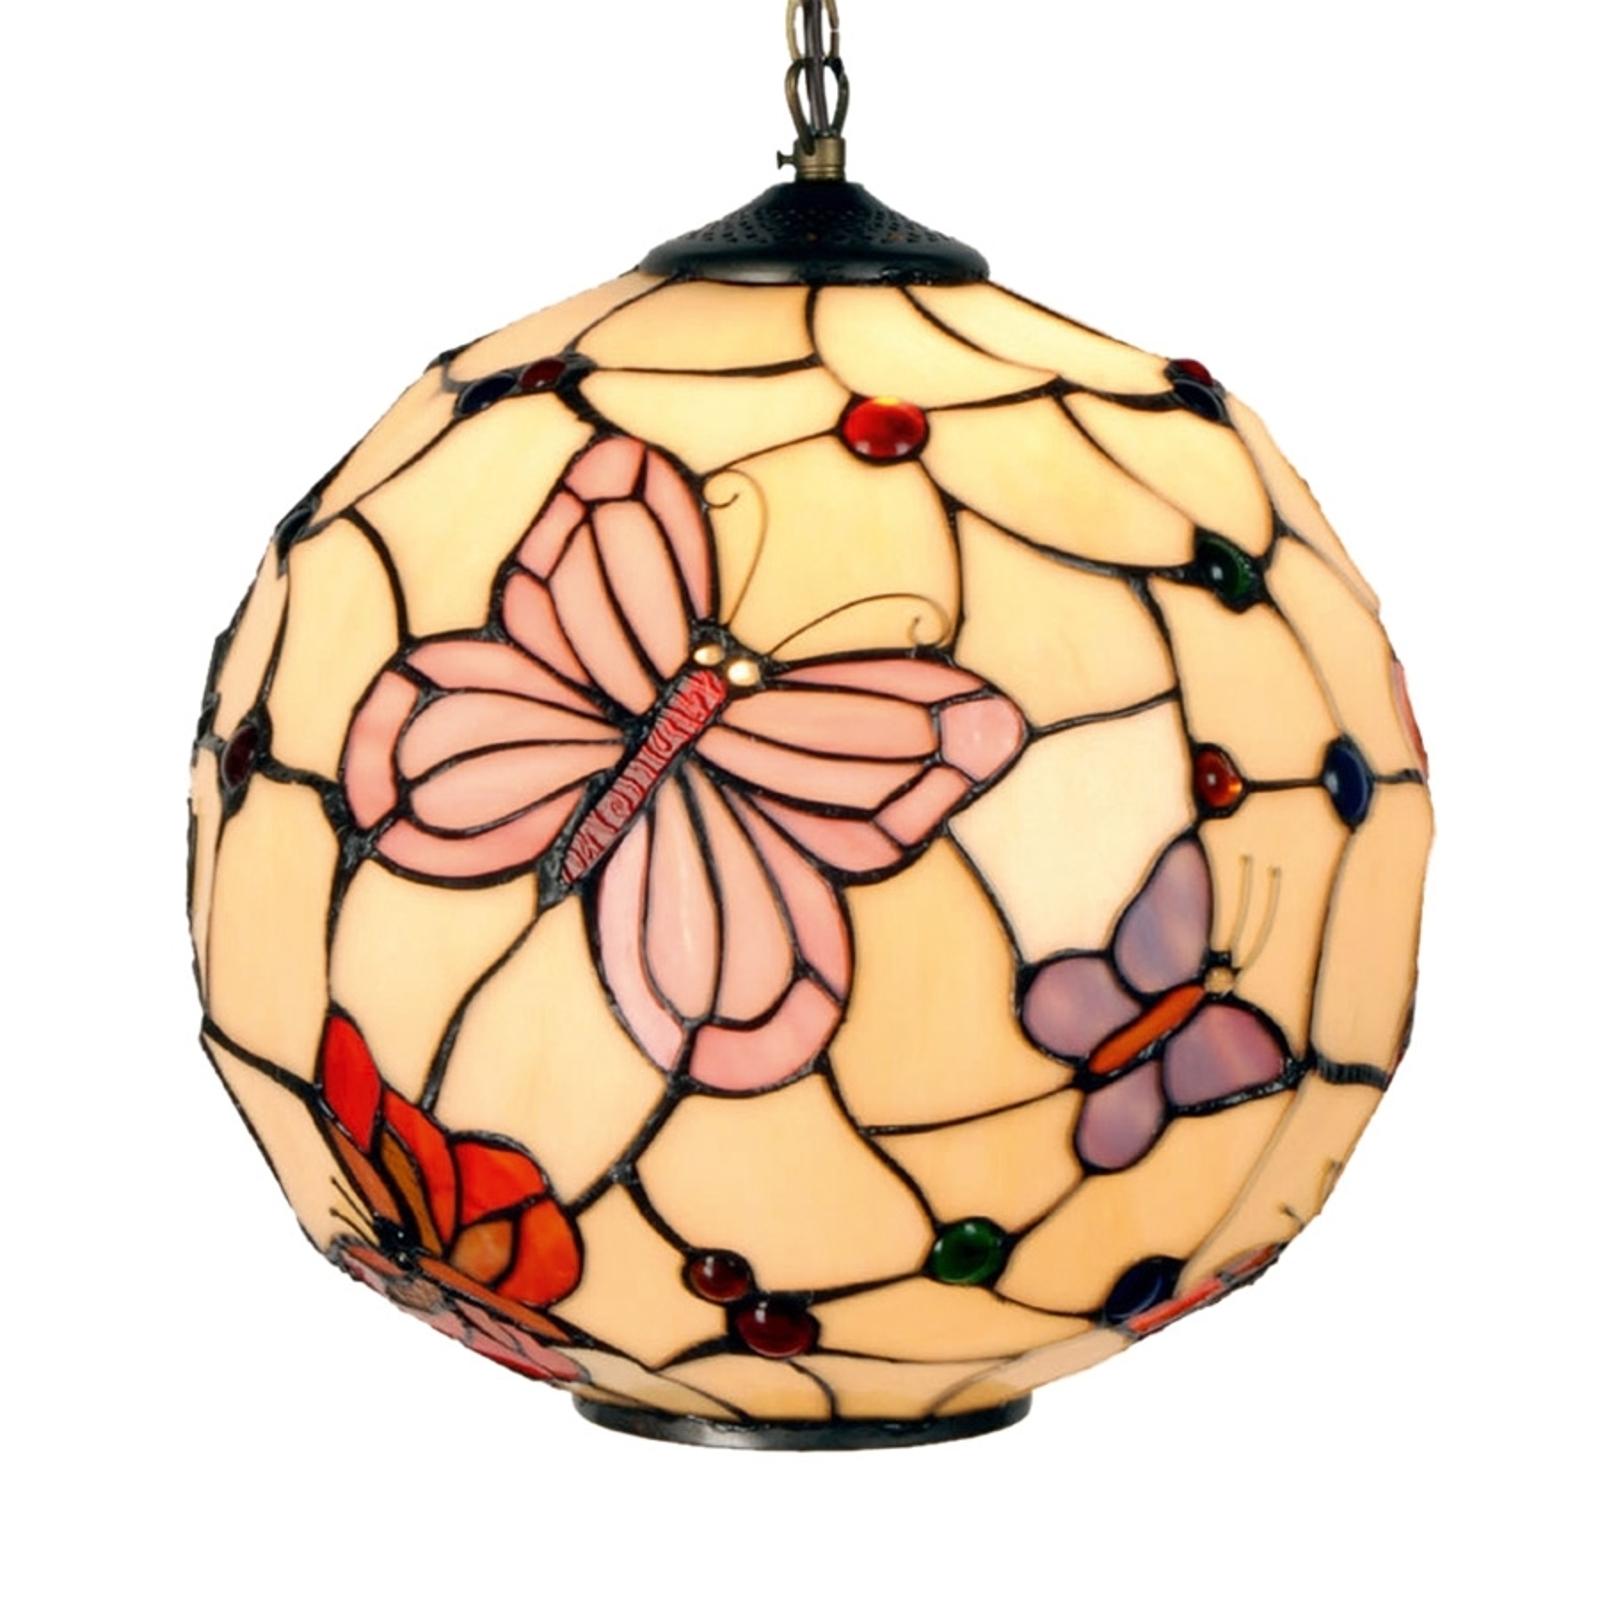 Tiffany stijl hanglamp Rosy Butterfly